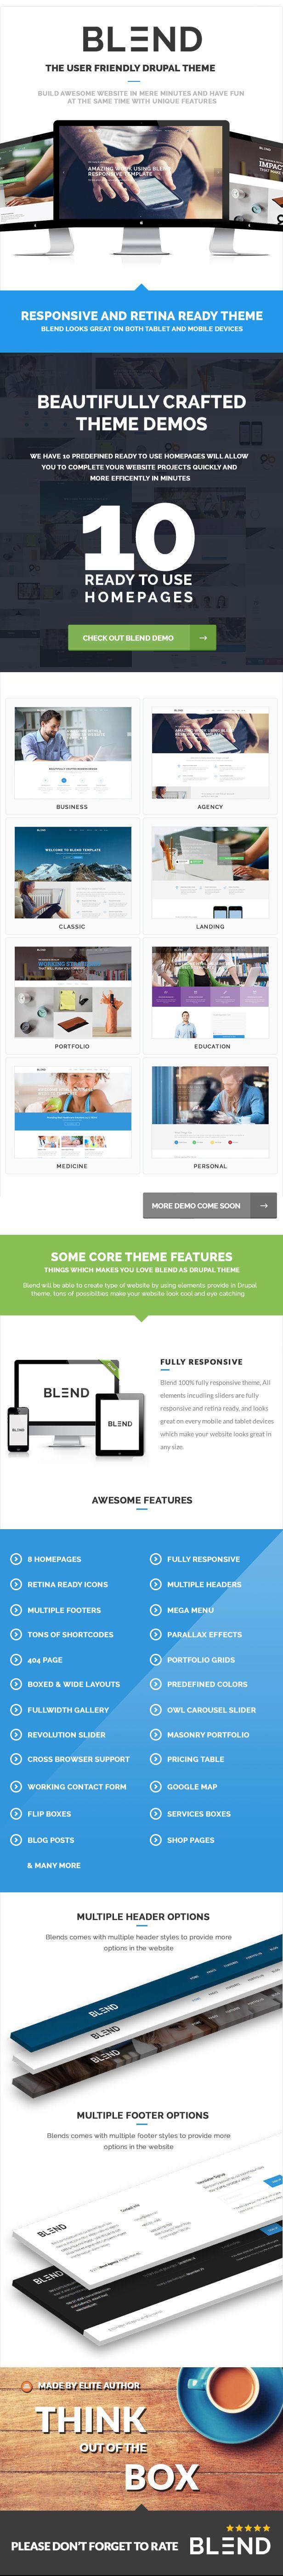 30 best top drupal themes images on pinterest website template